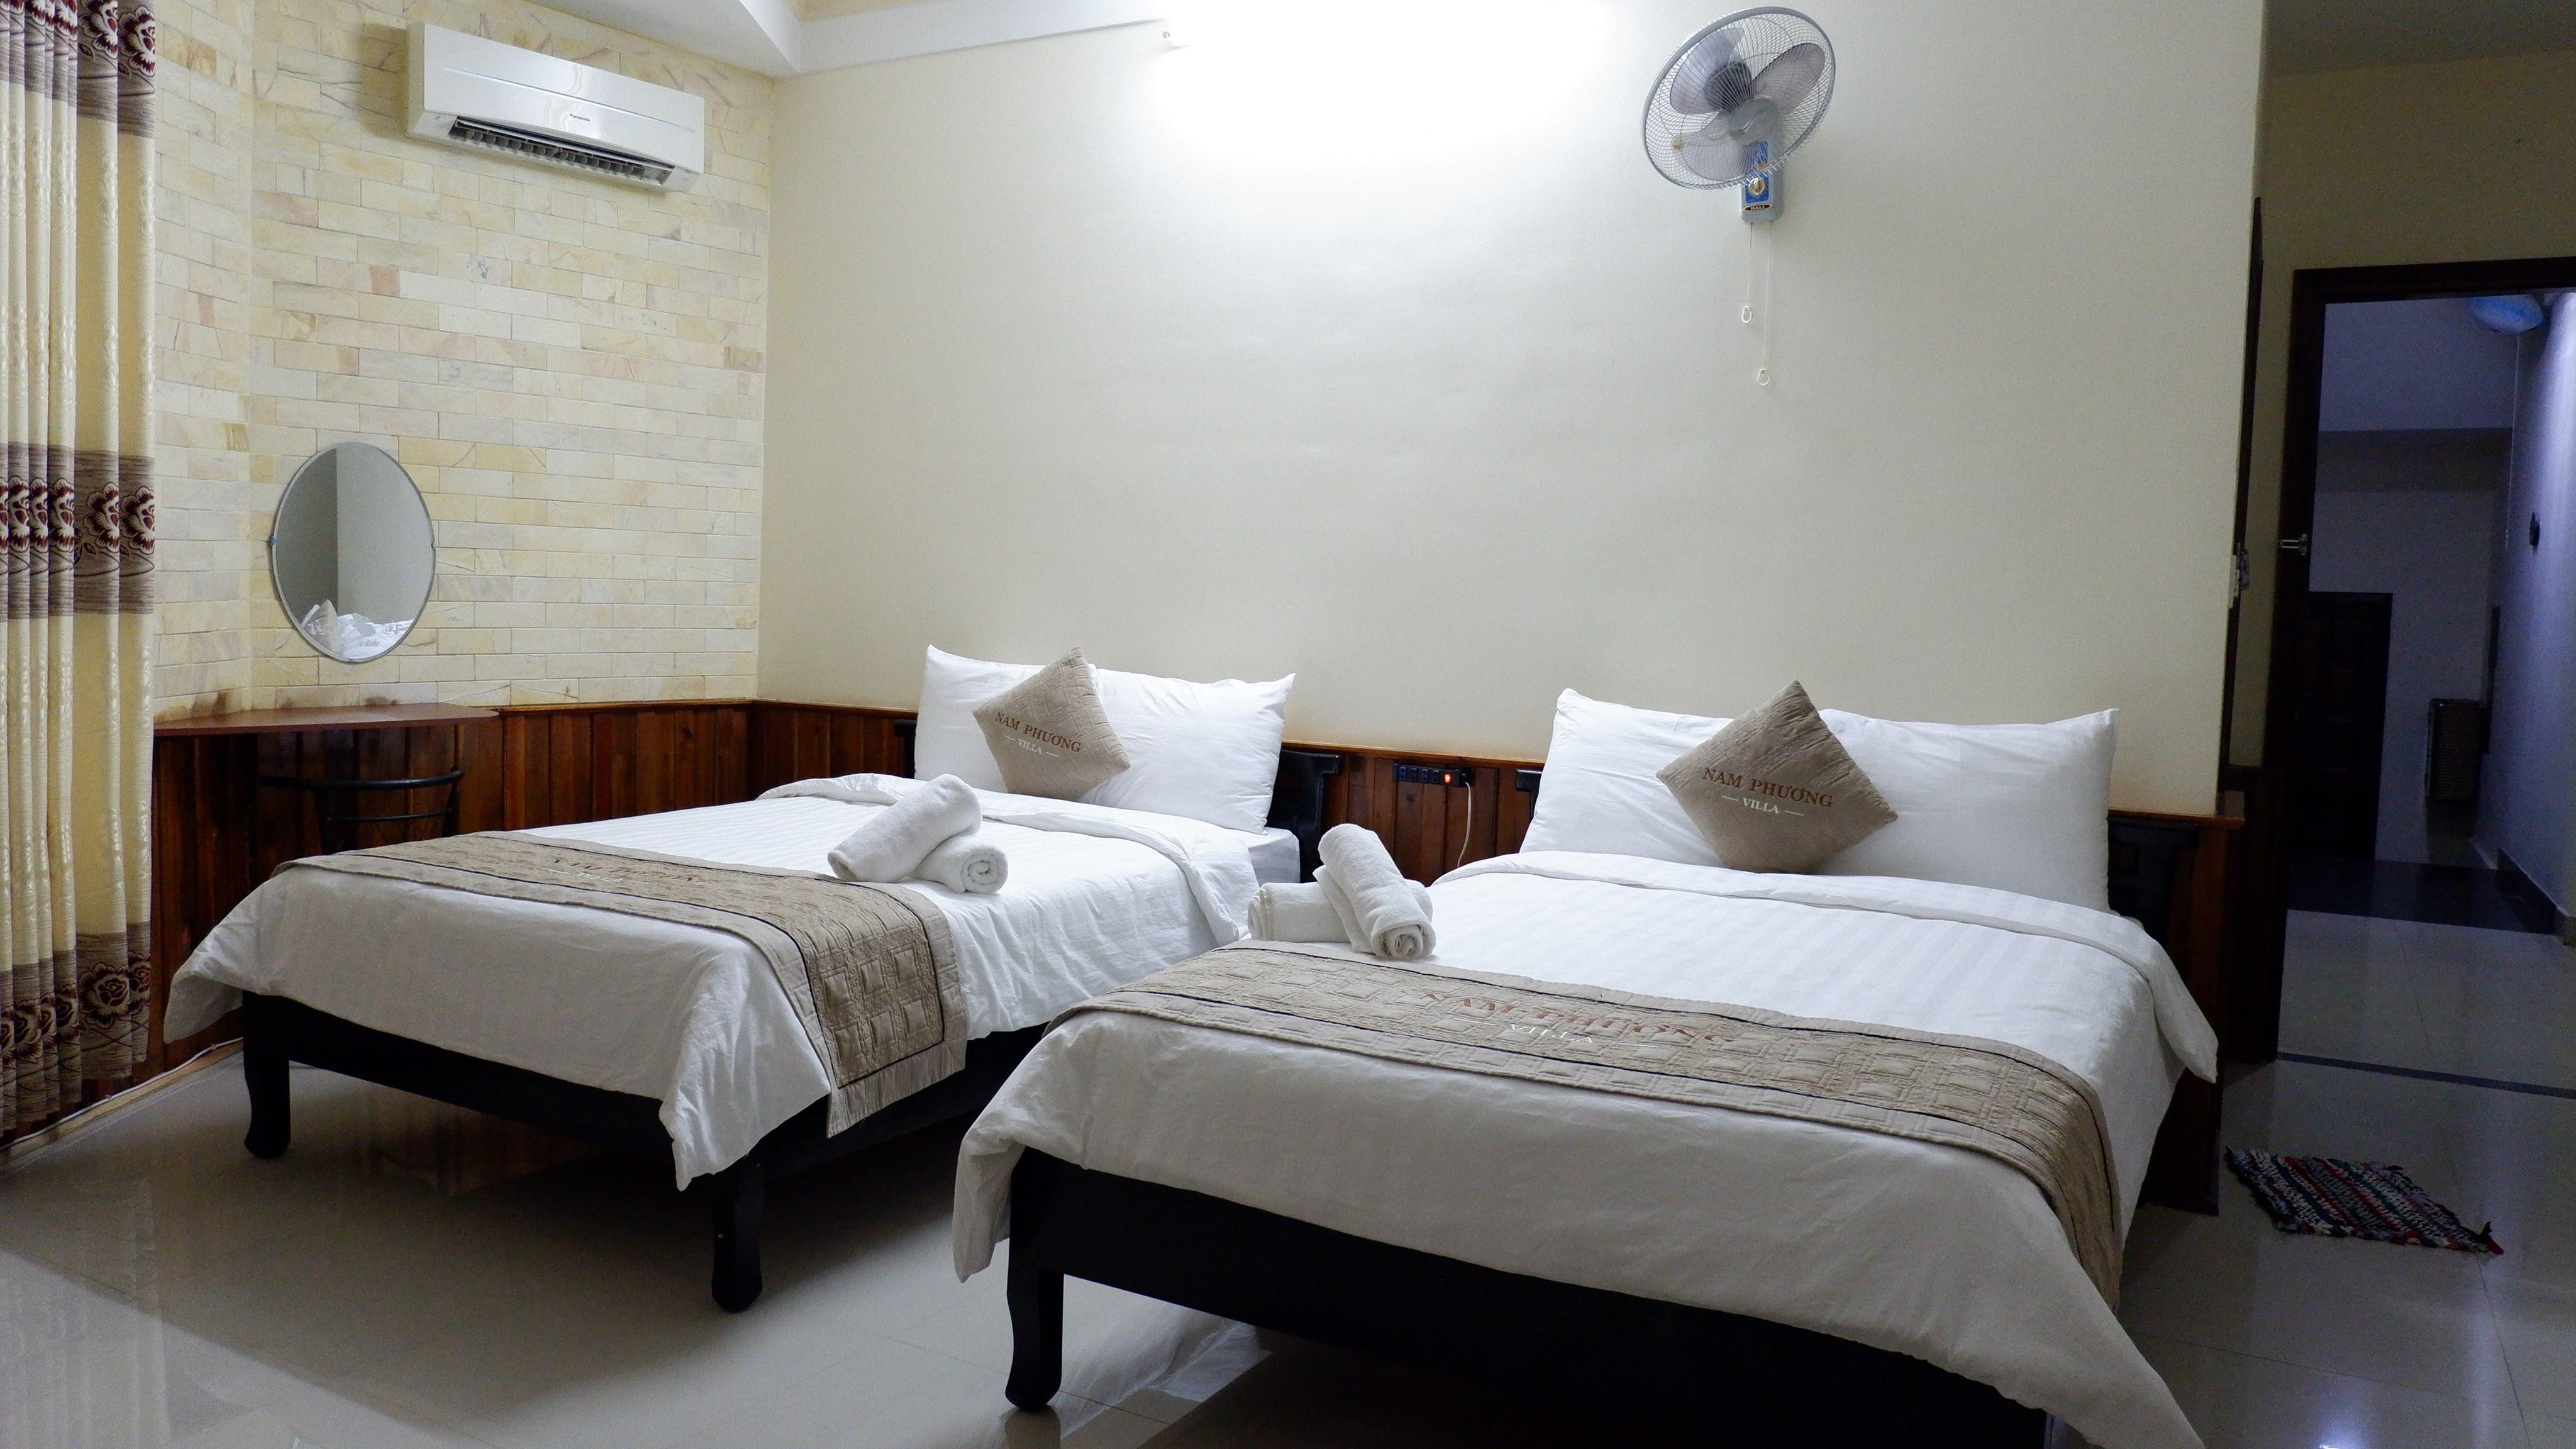 nam-phuong-hotel-hue-vietnam (4)